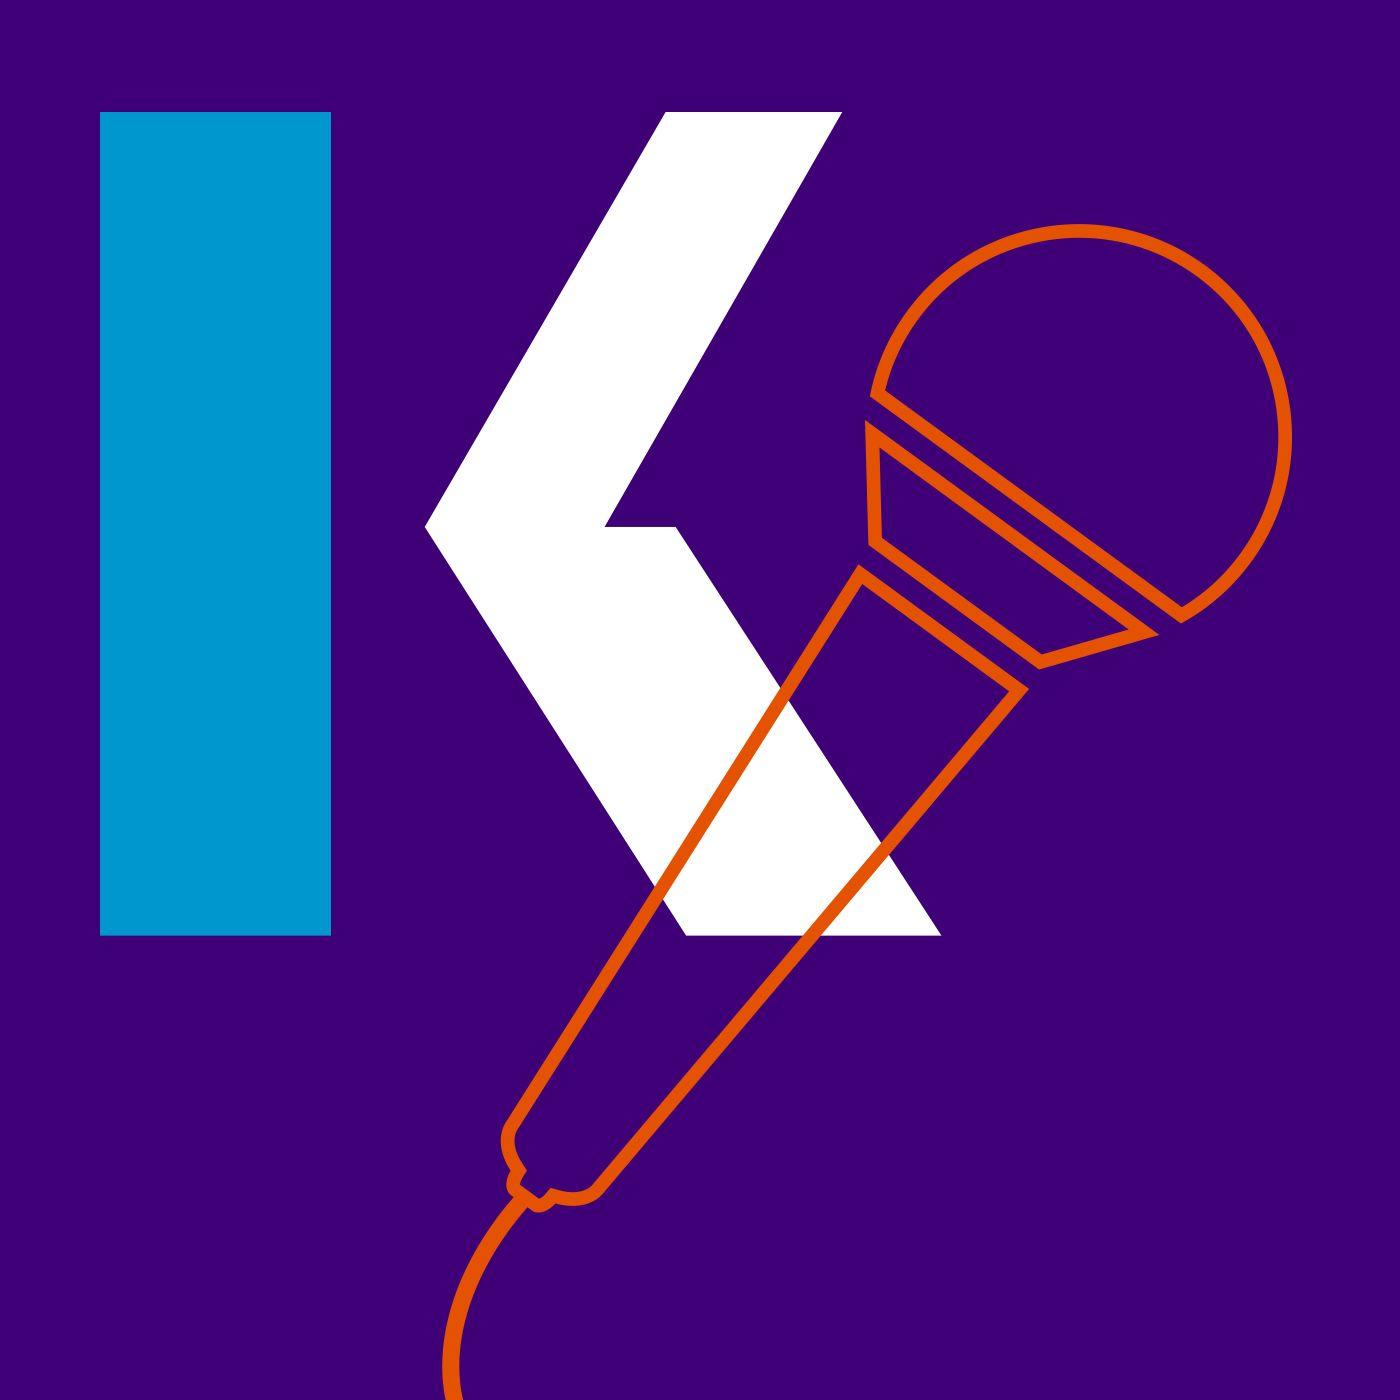 Kaplan's NCLEX Prepcast - Episode 28 - NCLEX® resources worth trying